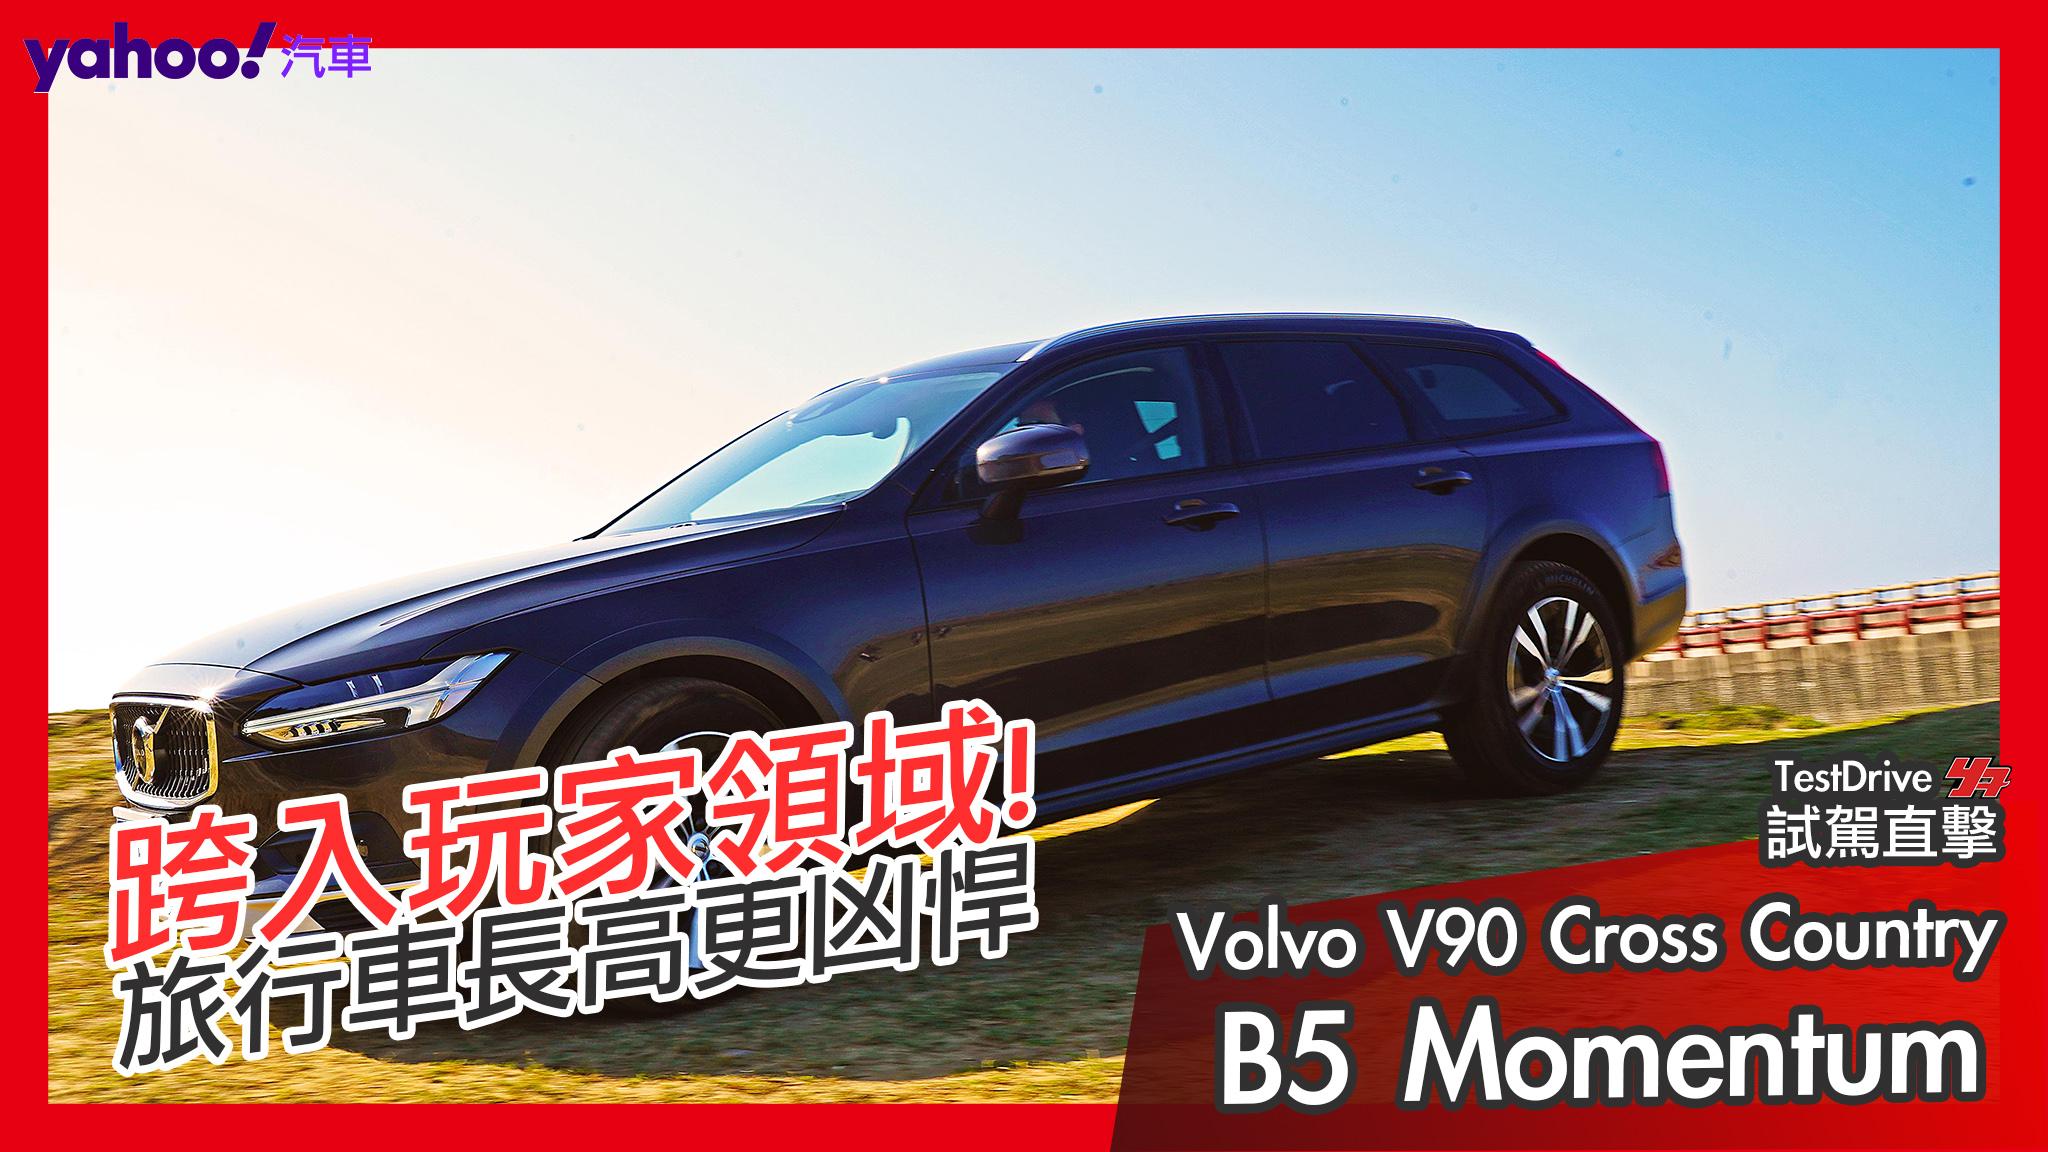 【試駕直擊】跨入玩家領域!2021 Volvo V90 Cross Country B5 Momentum輕越野試駕